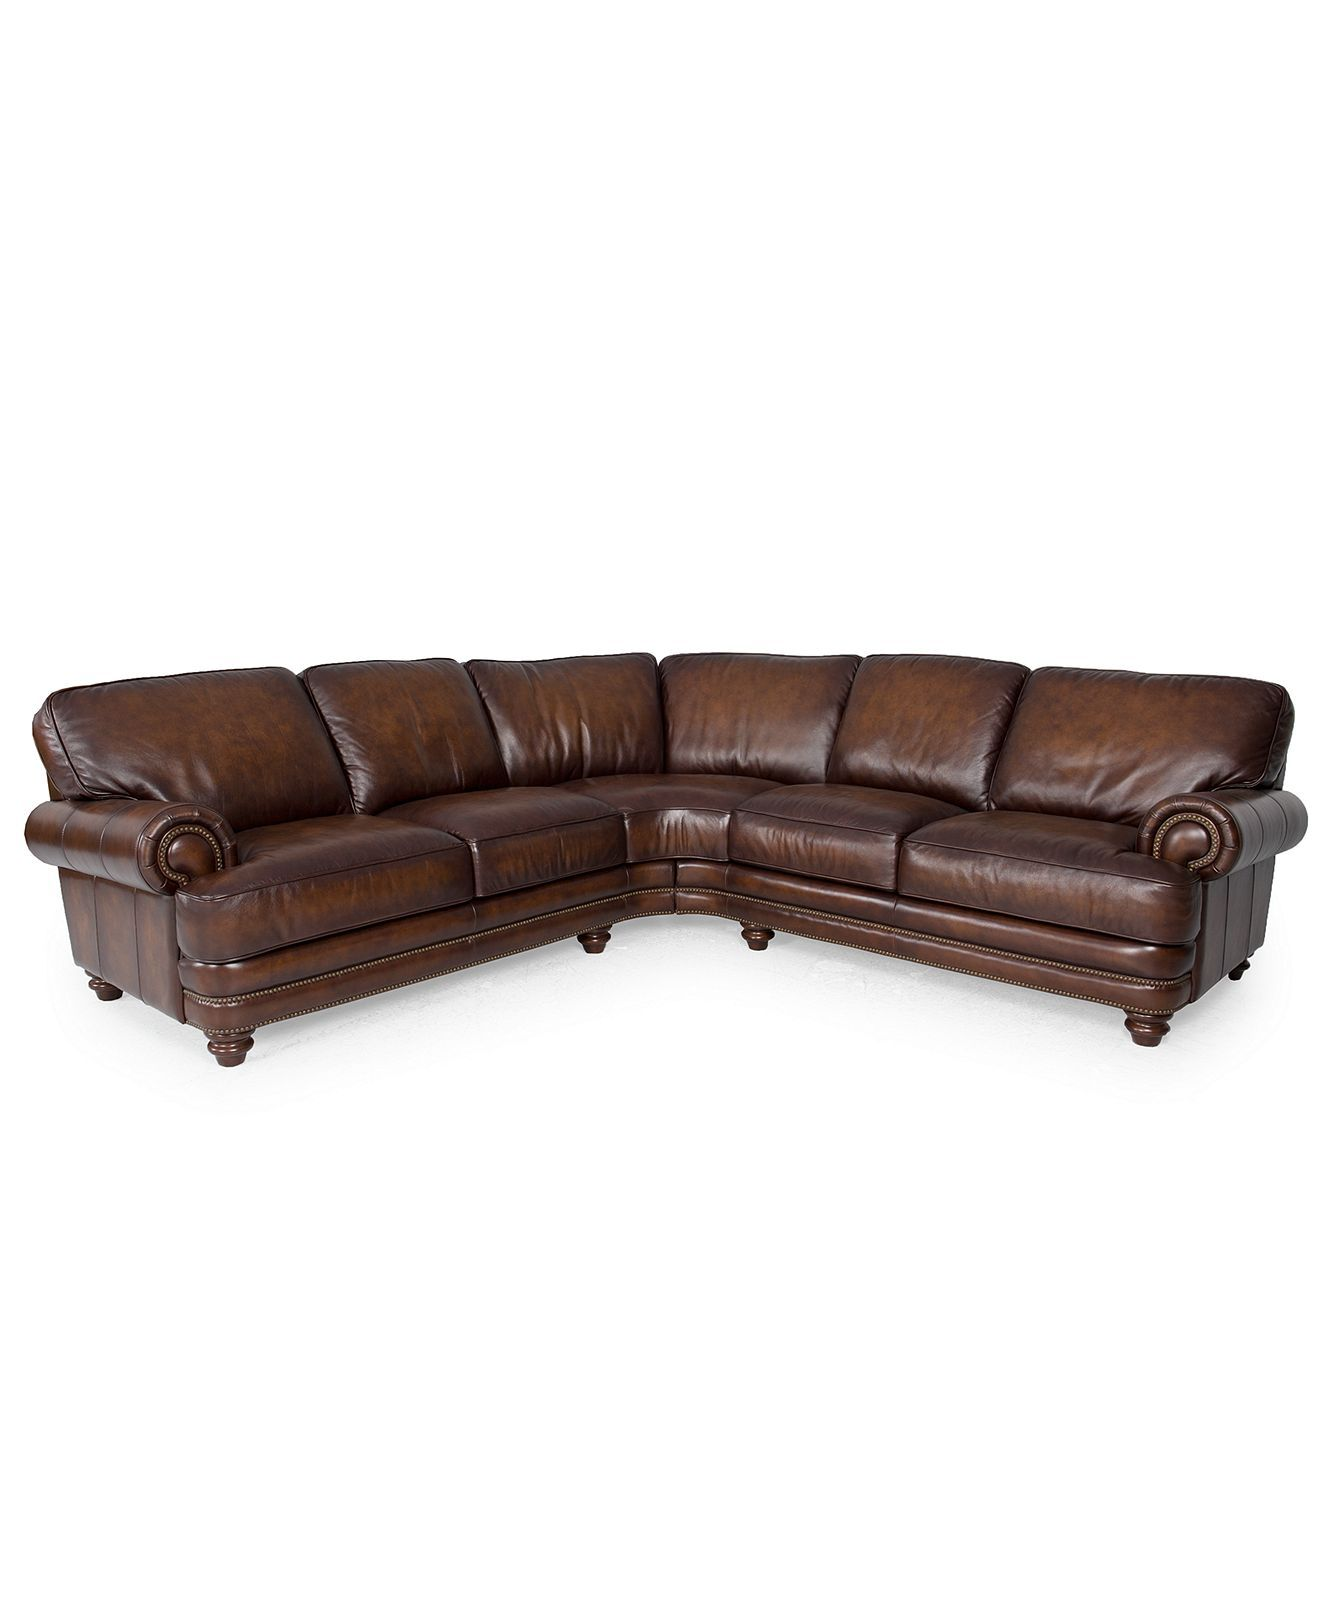 Brett Leather Sectional Sofa 2 Piece Right Arm Facing Sofa